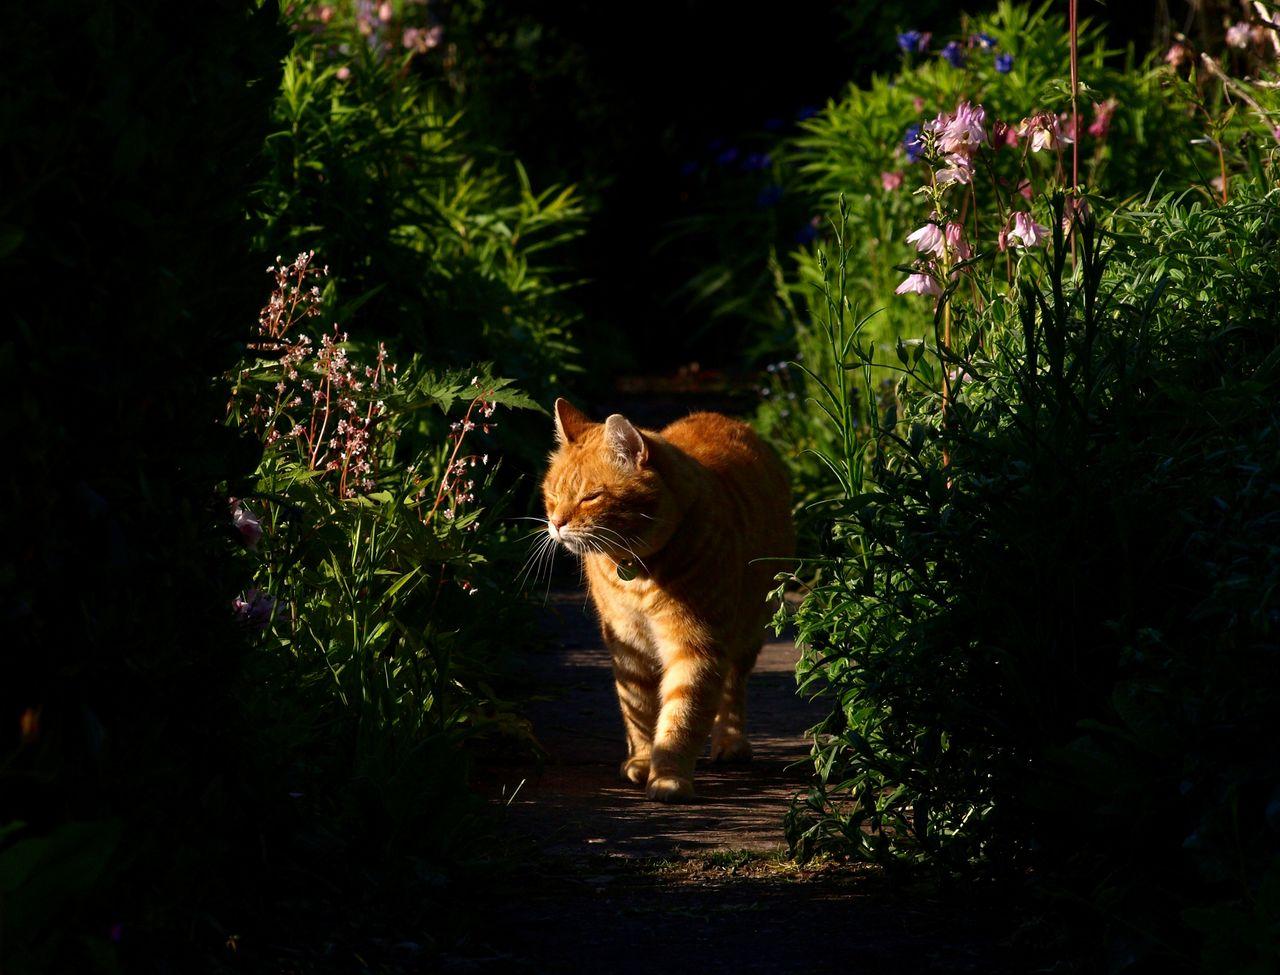 Ginger Cat Walking Amidst Plants At Park